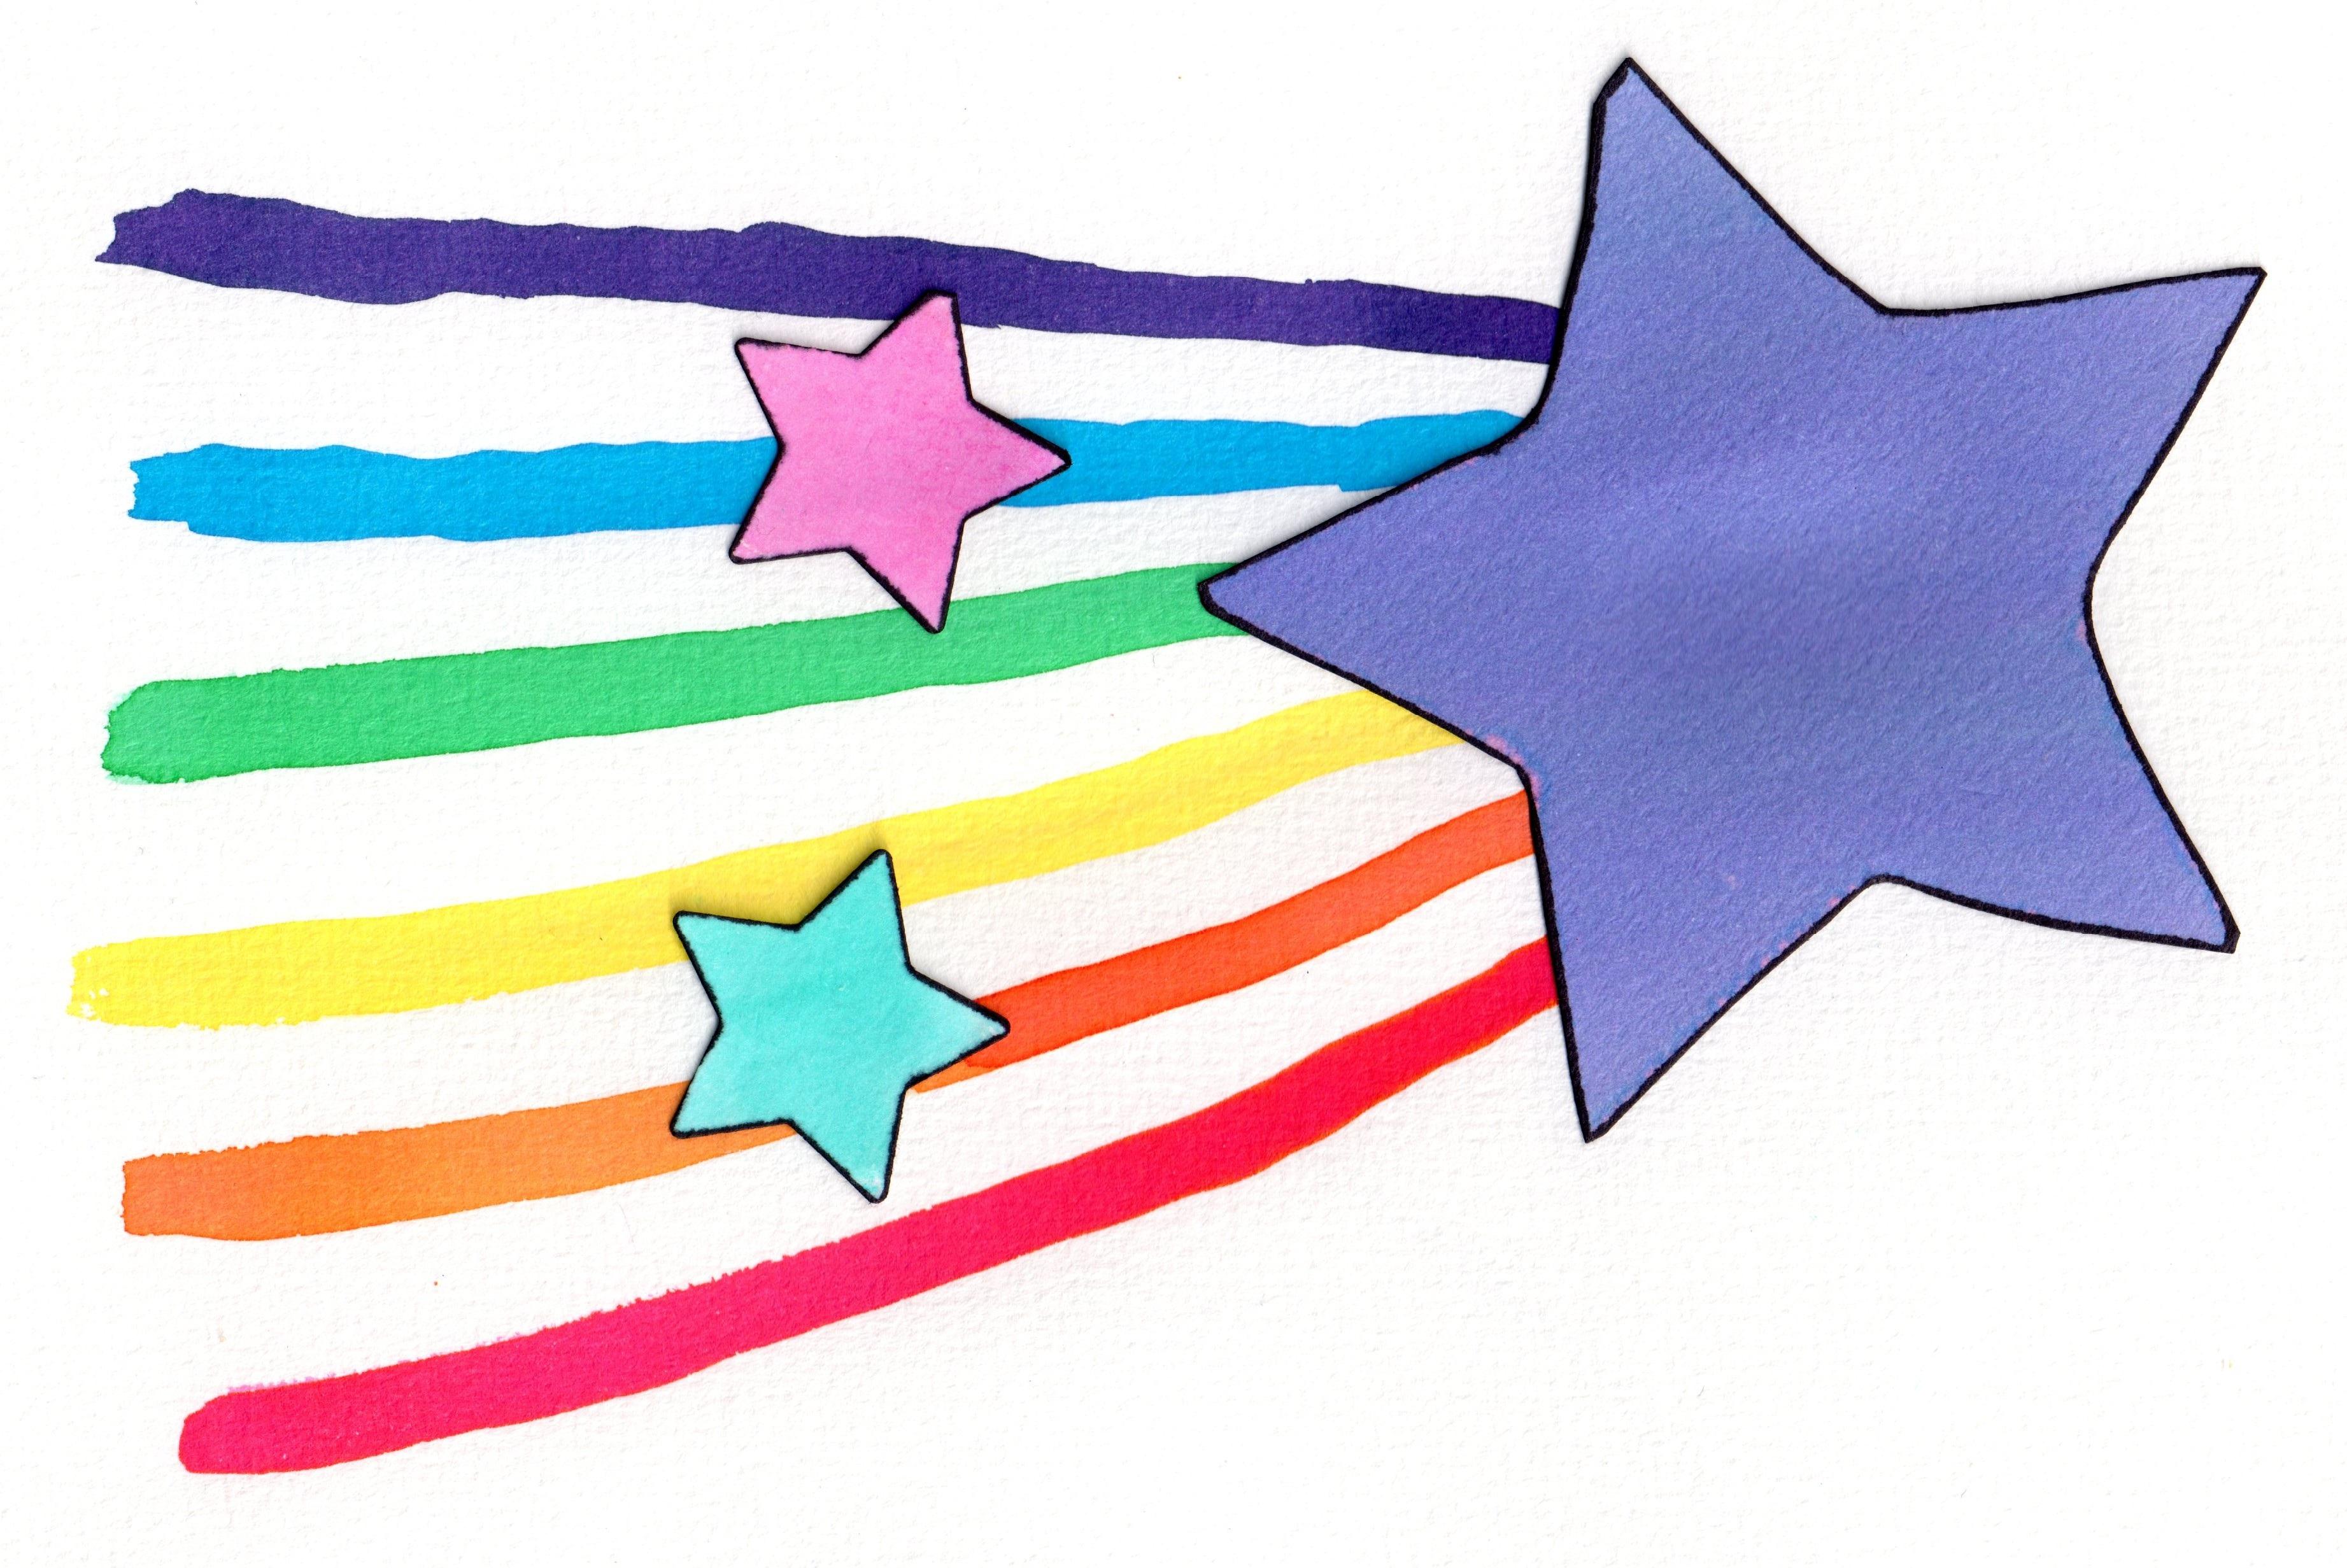 Emeline & ses étoiles